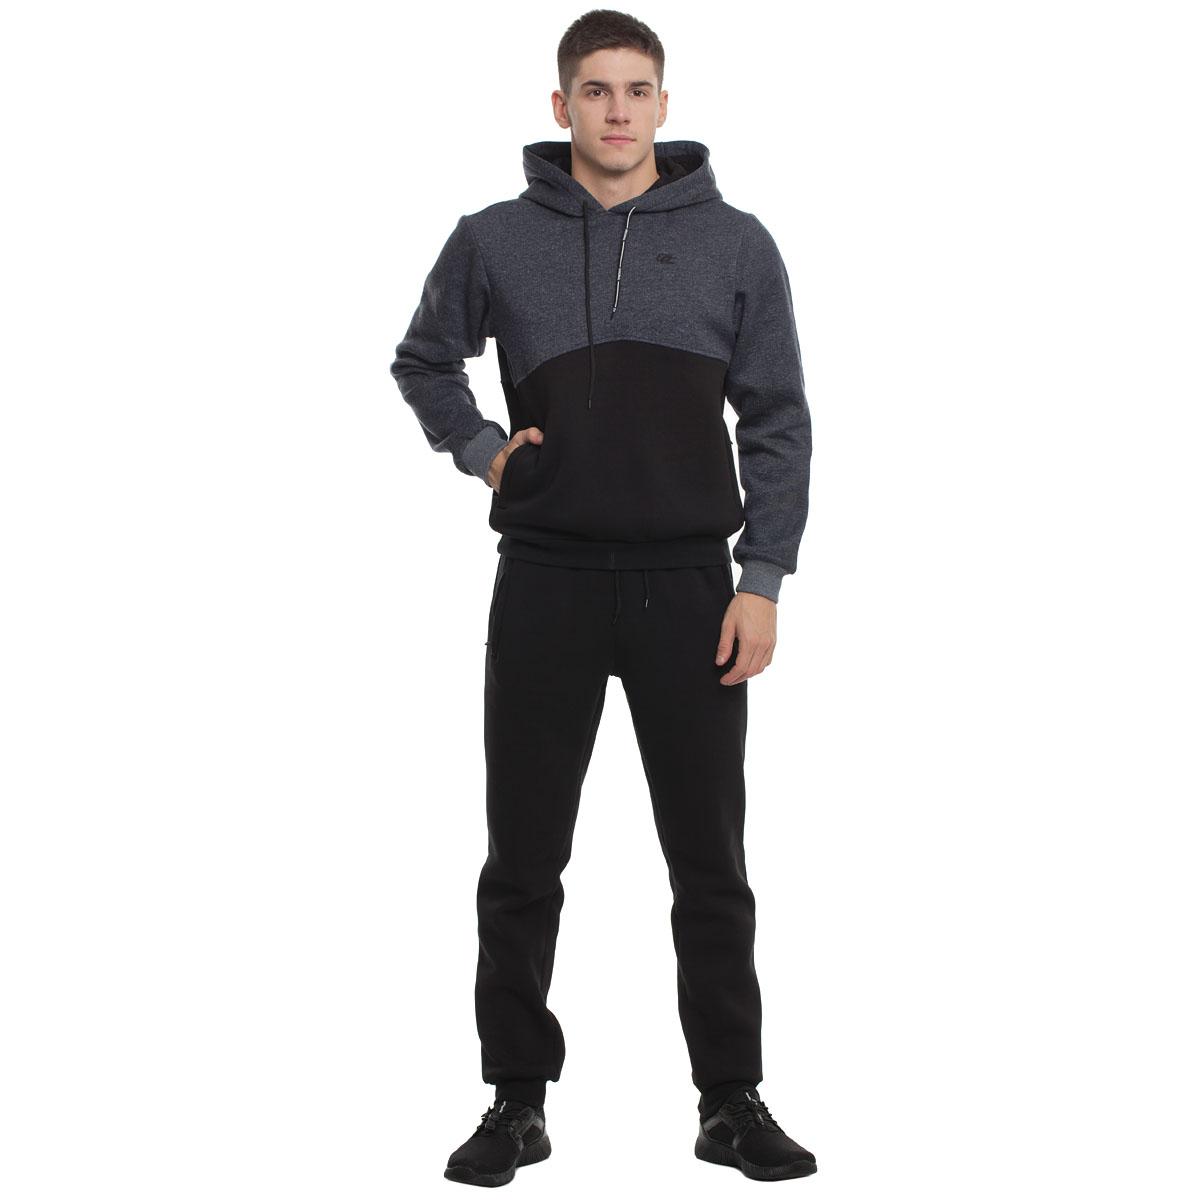 Костюм спортивный Overcome, M0022 цена 2017